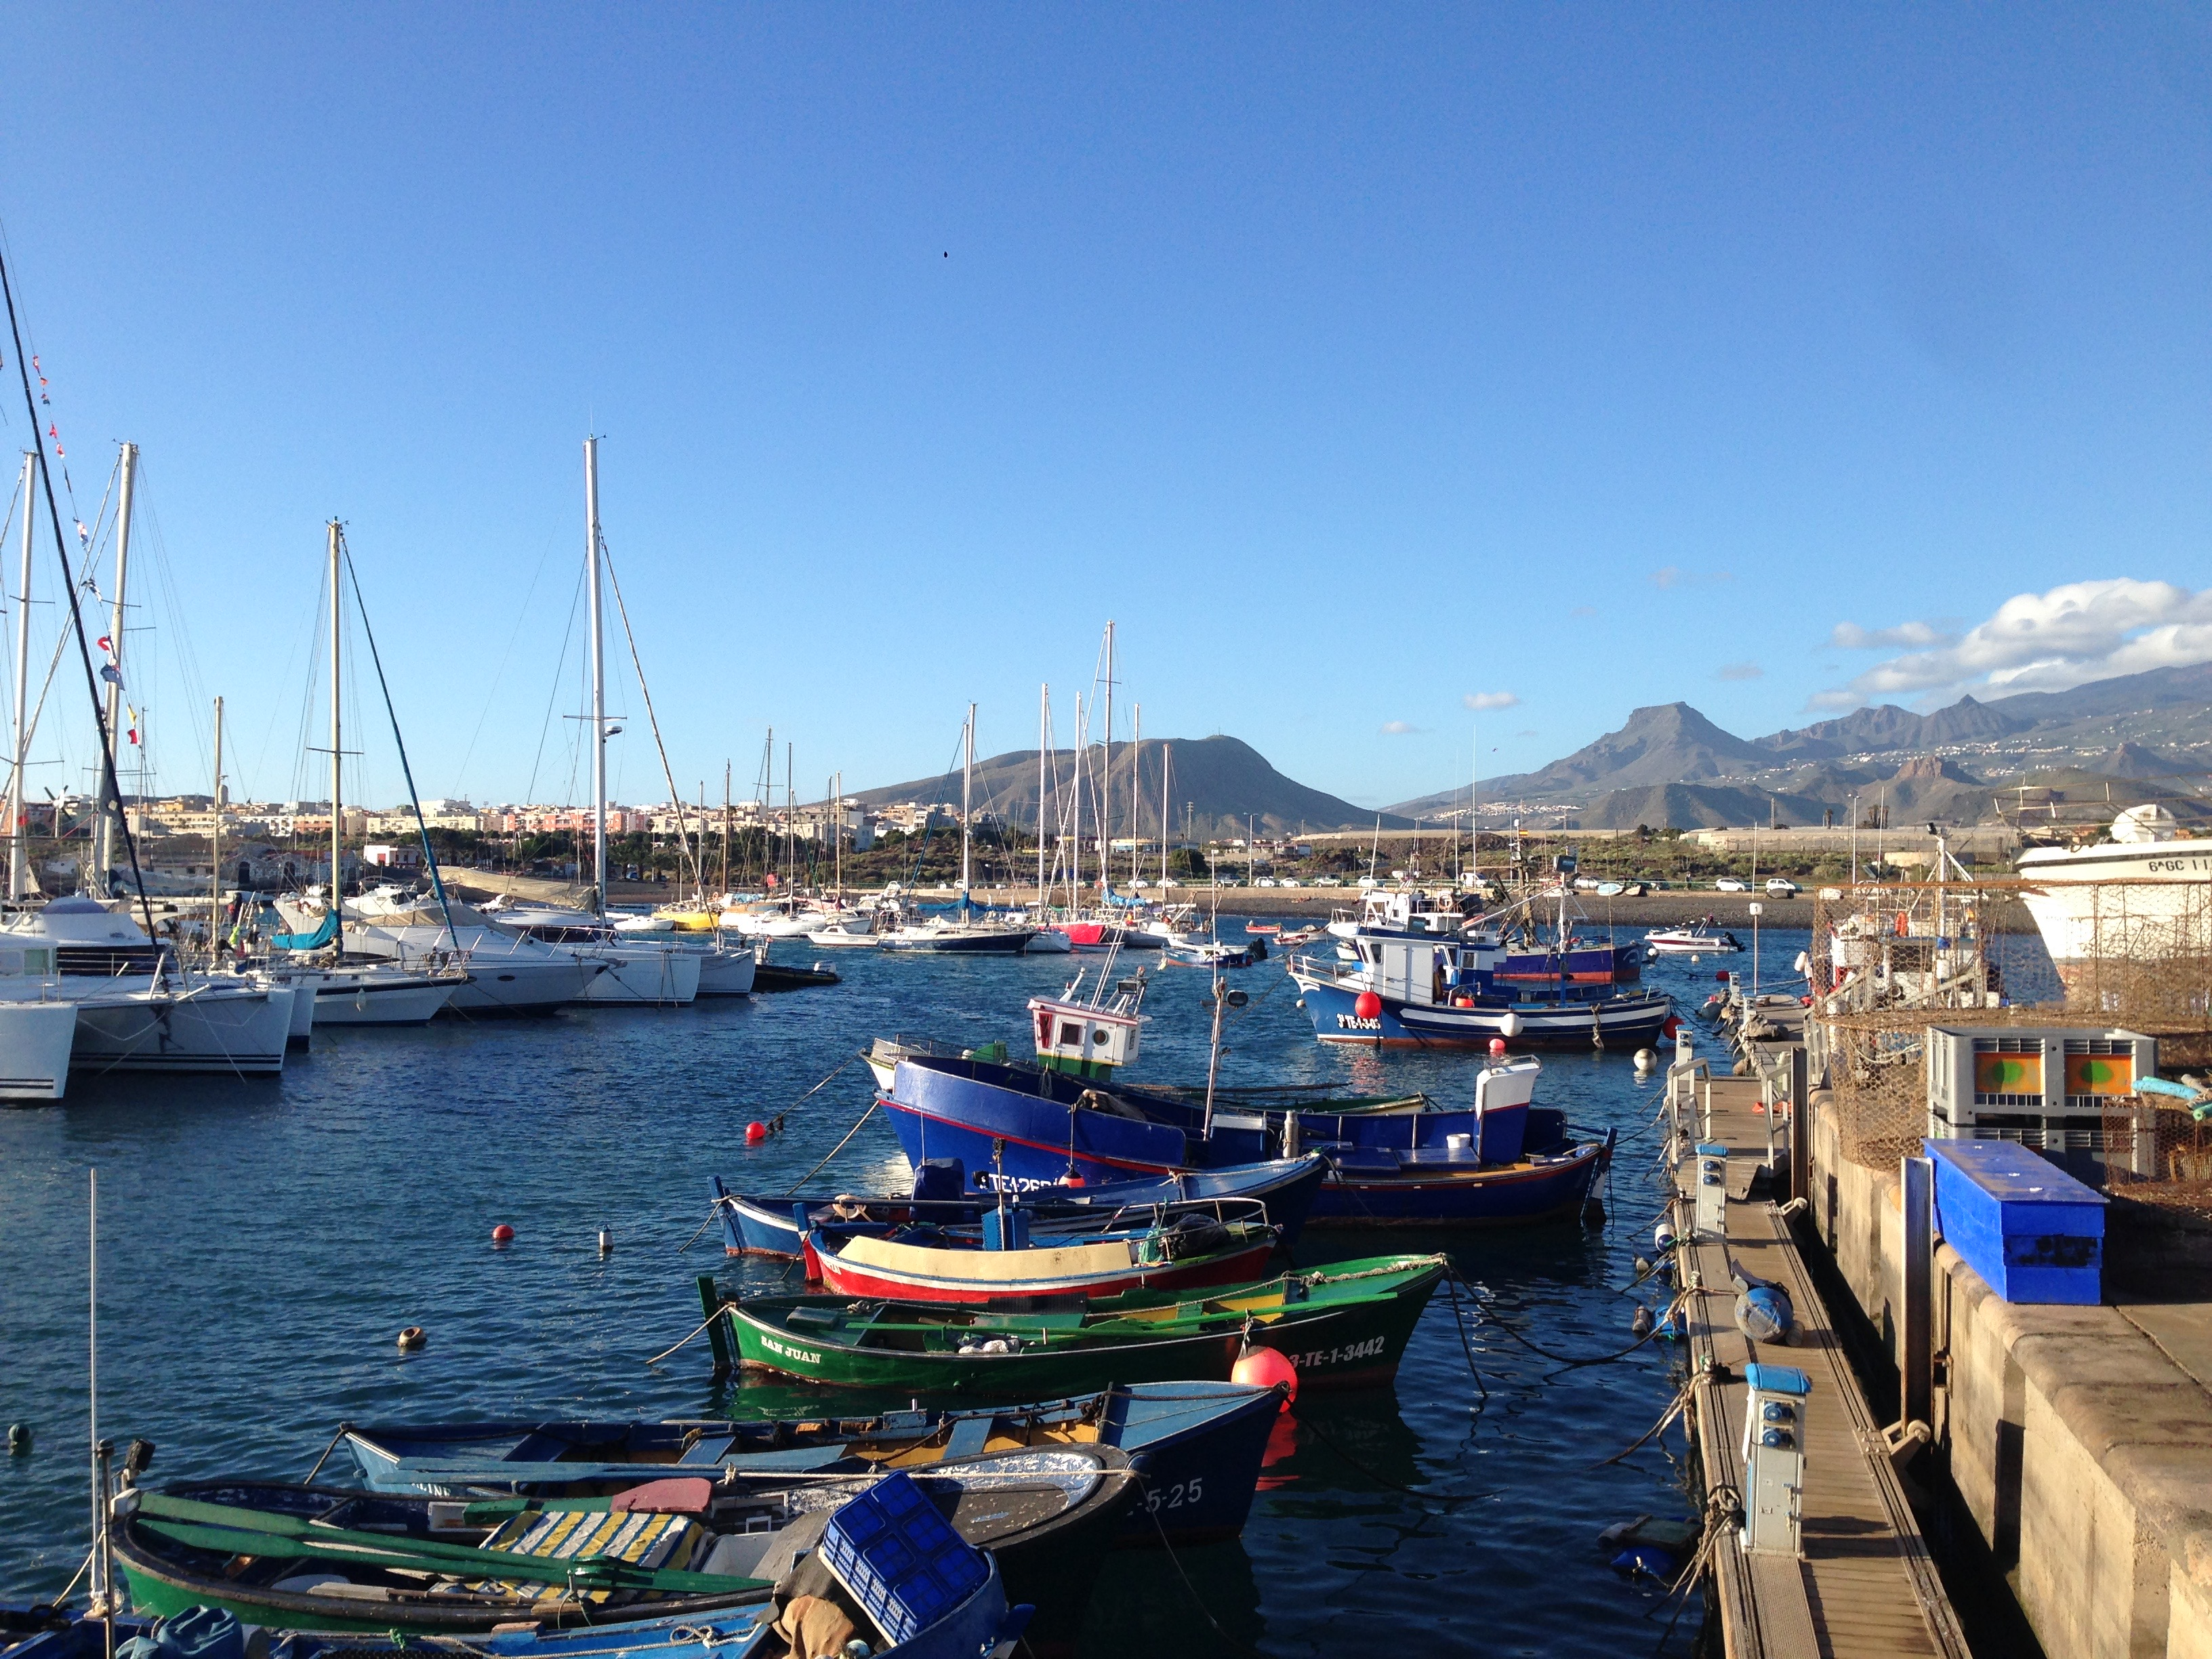 Tenerife Sur Fishermens boats